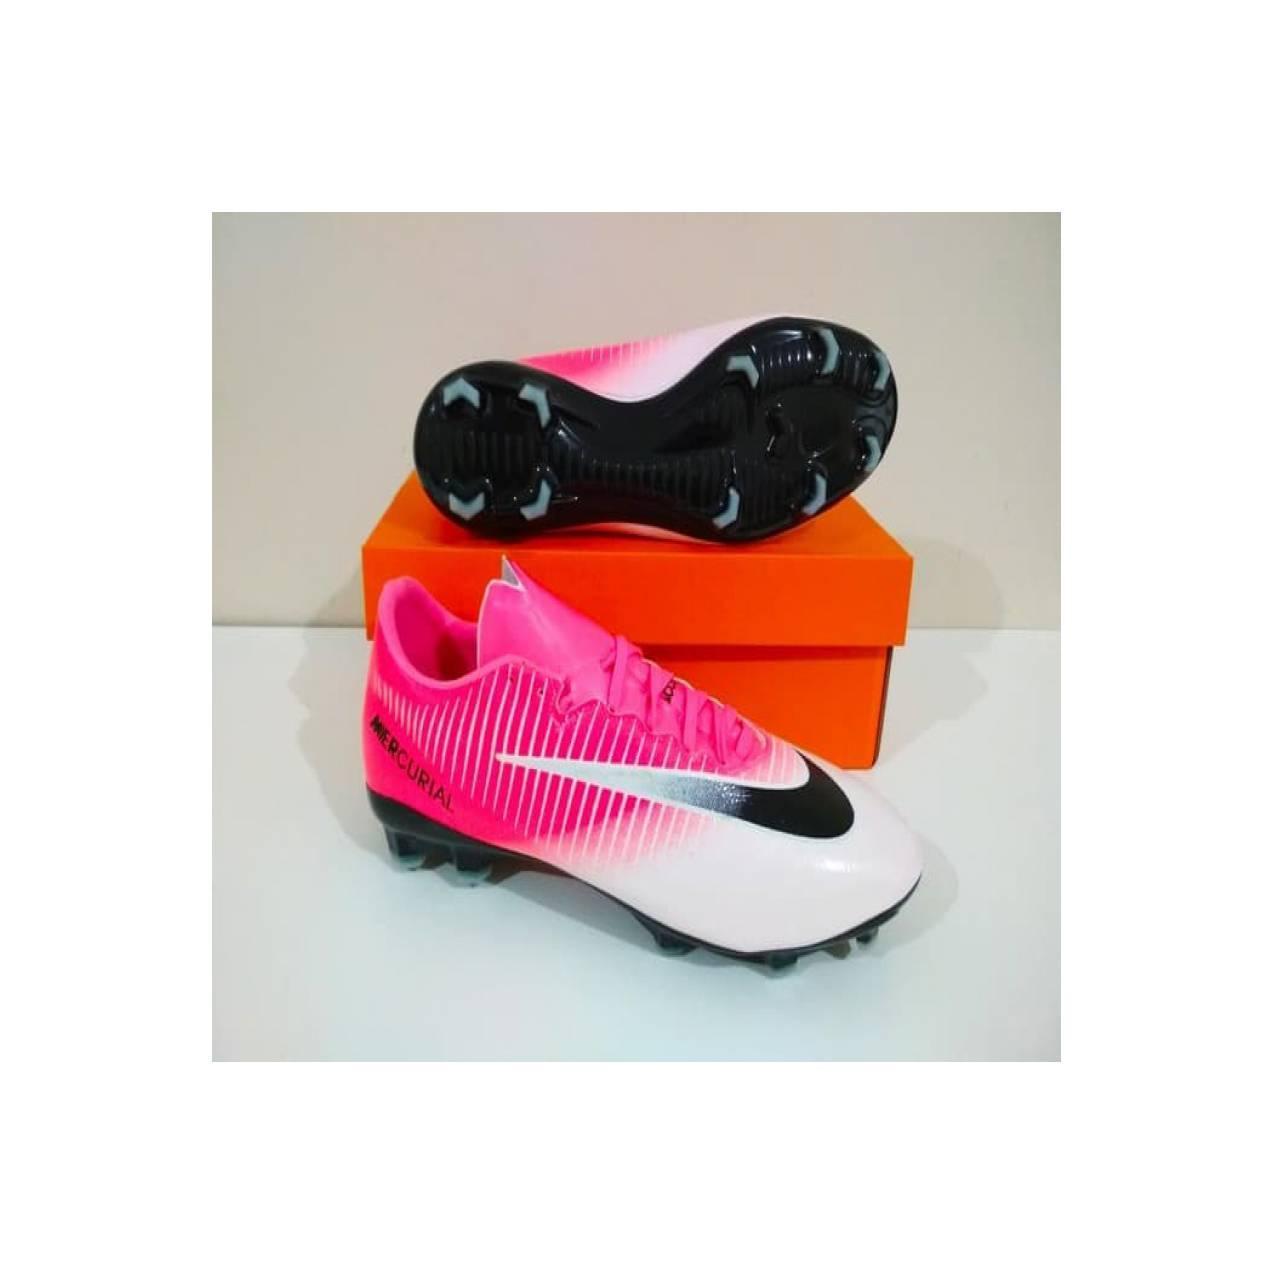 Murah- Sepatu Bola NIKE Mercurial Vapor FG Pink White